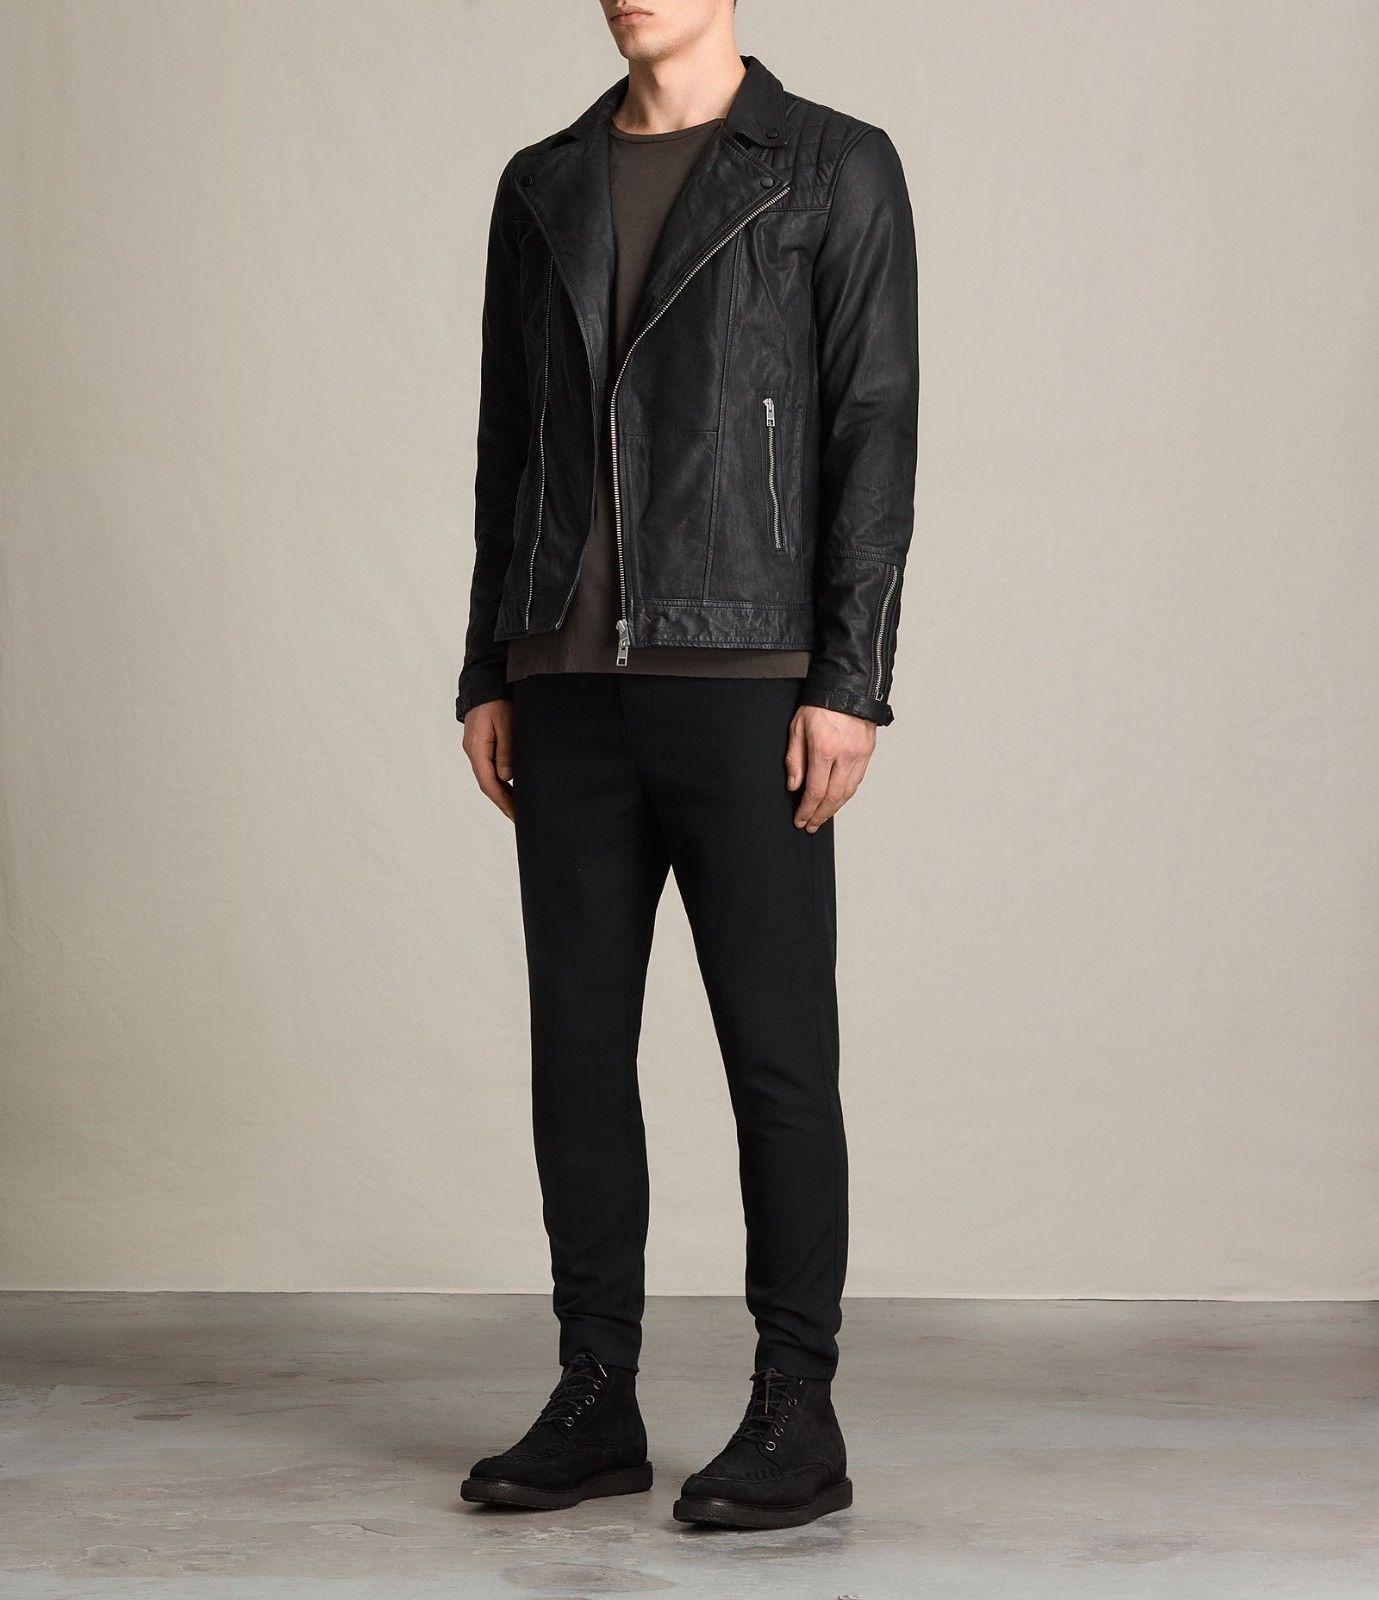 New Men's Genuine Lambskin Leather Jacket  Slim fit Biker Motorcycle jacket-G21